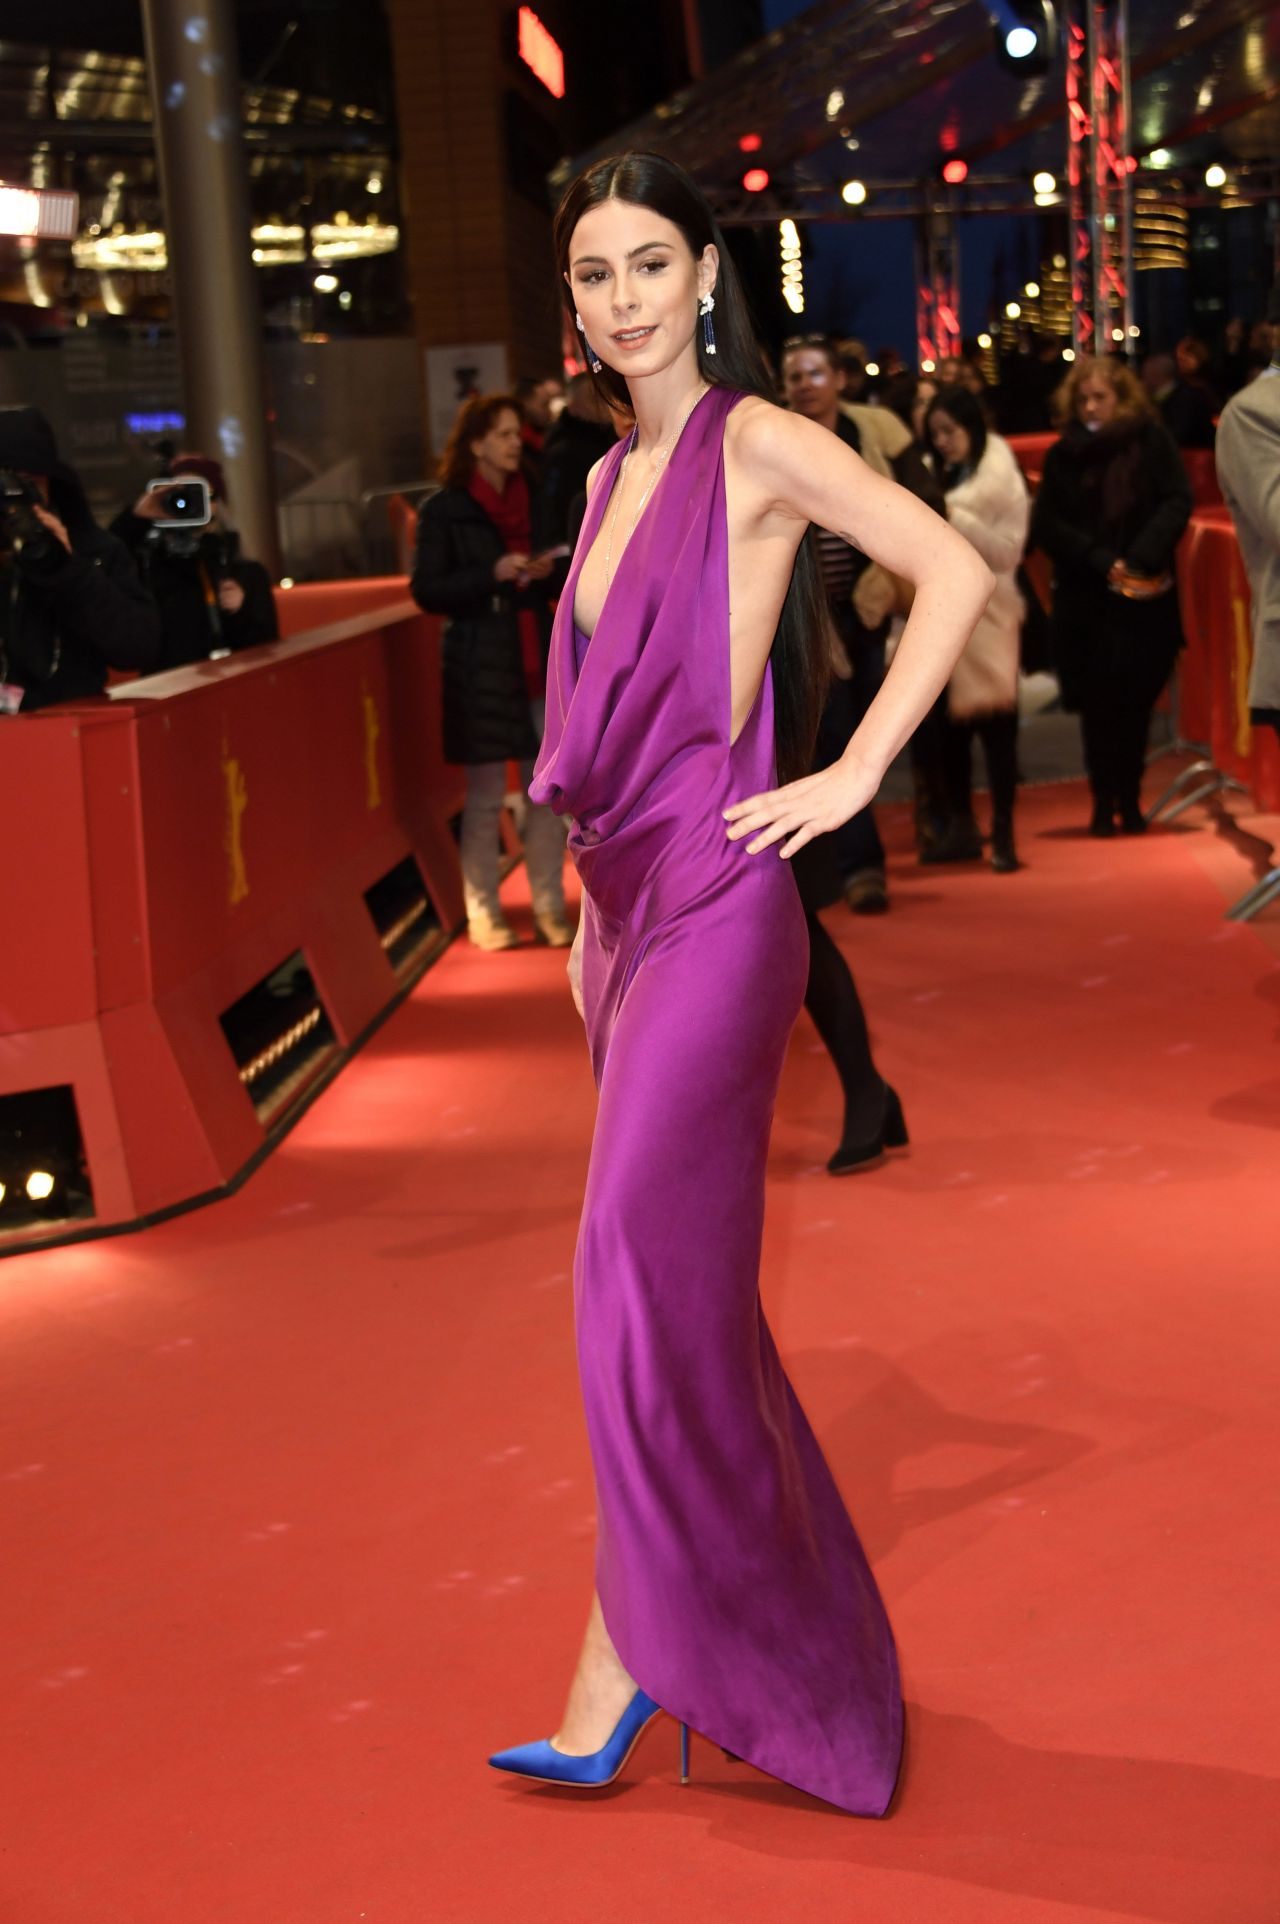 Lena Meyer Landrut U0026quot 3 Days In Quiberon U0026quot Premiere At